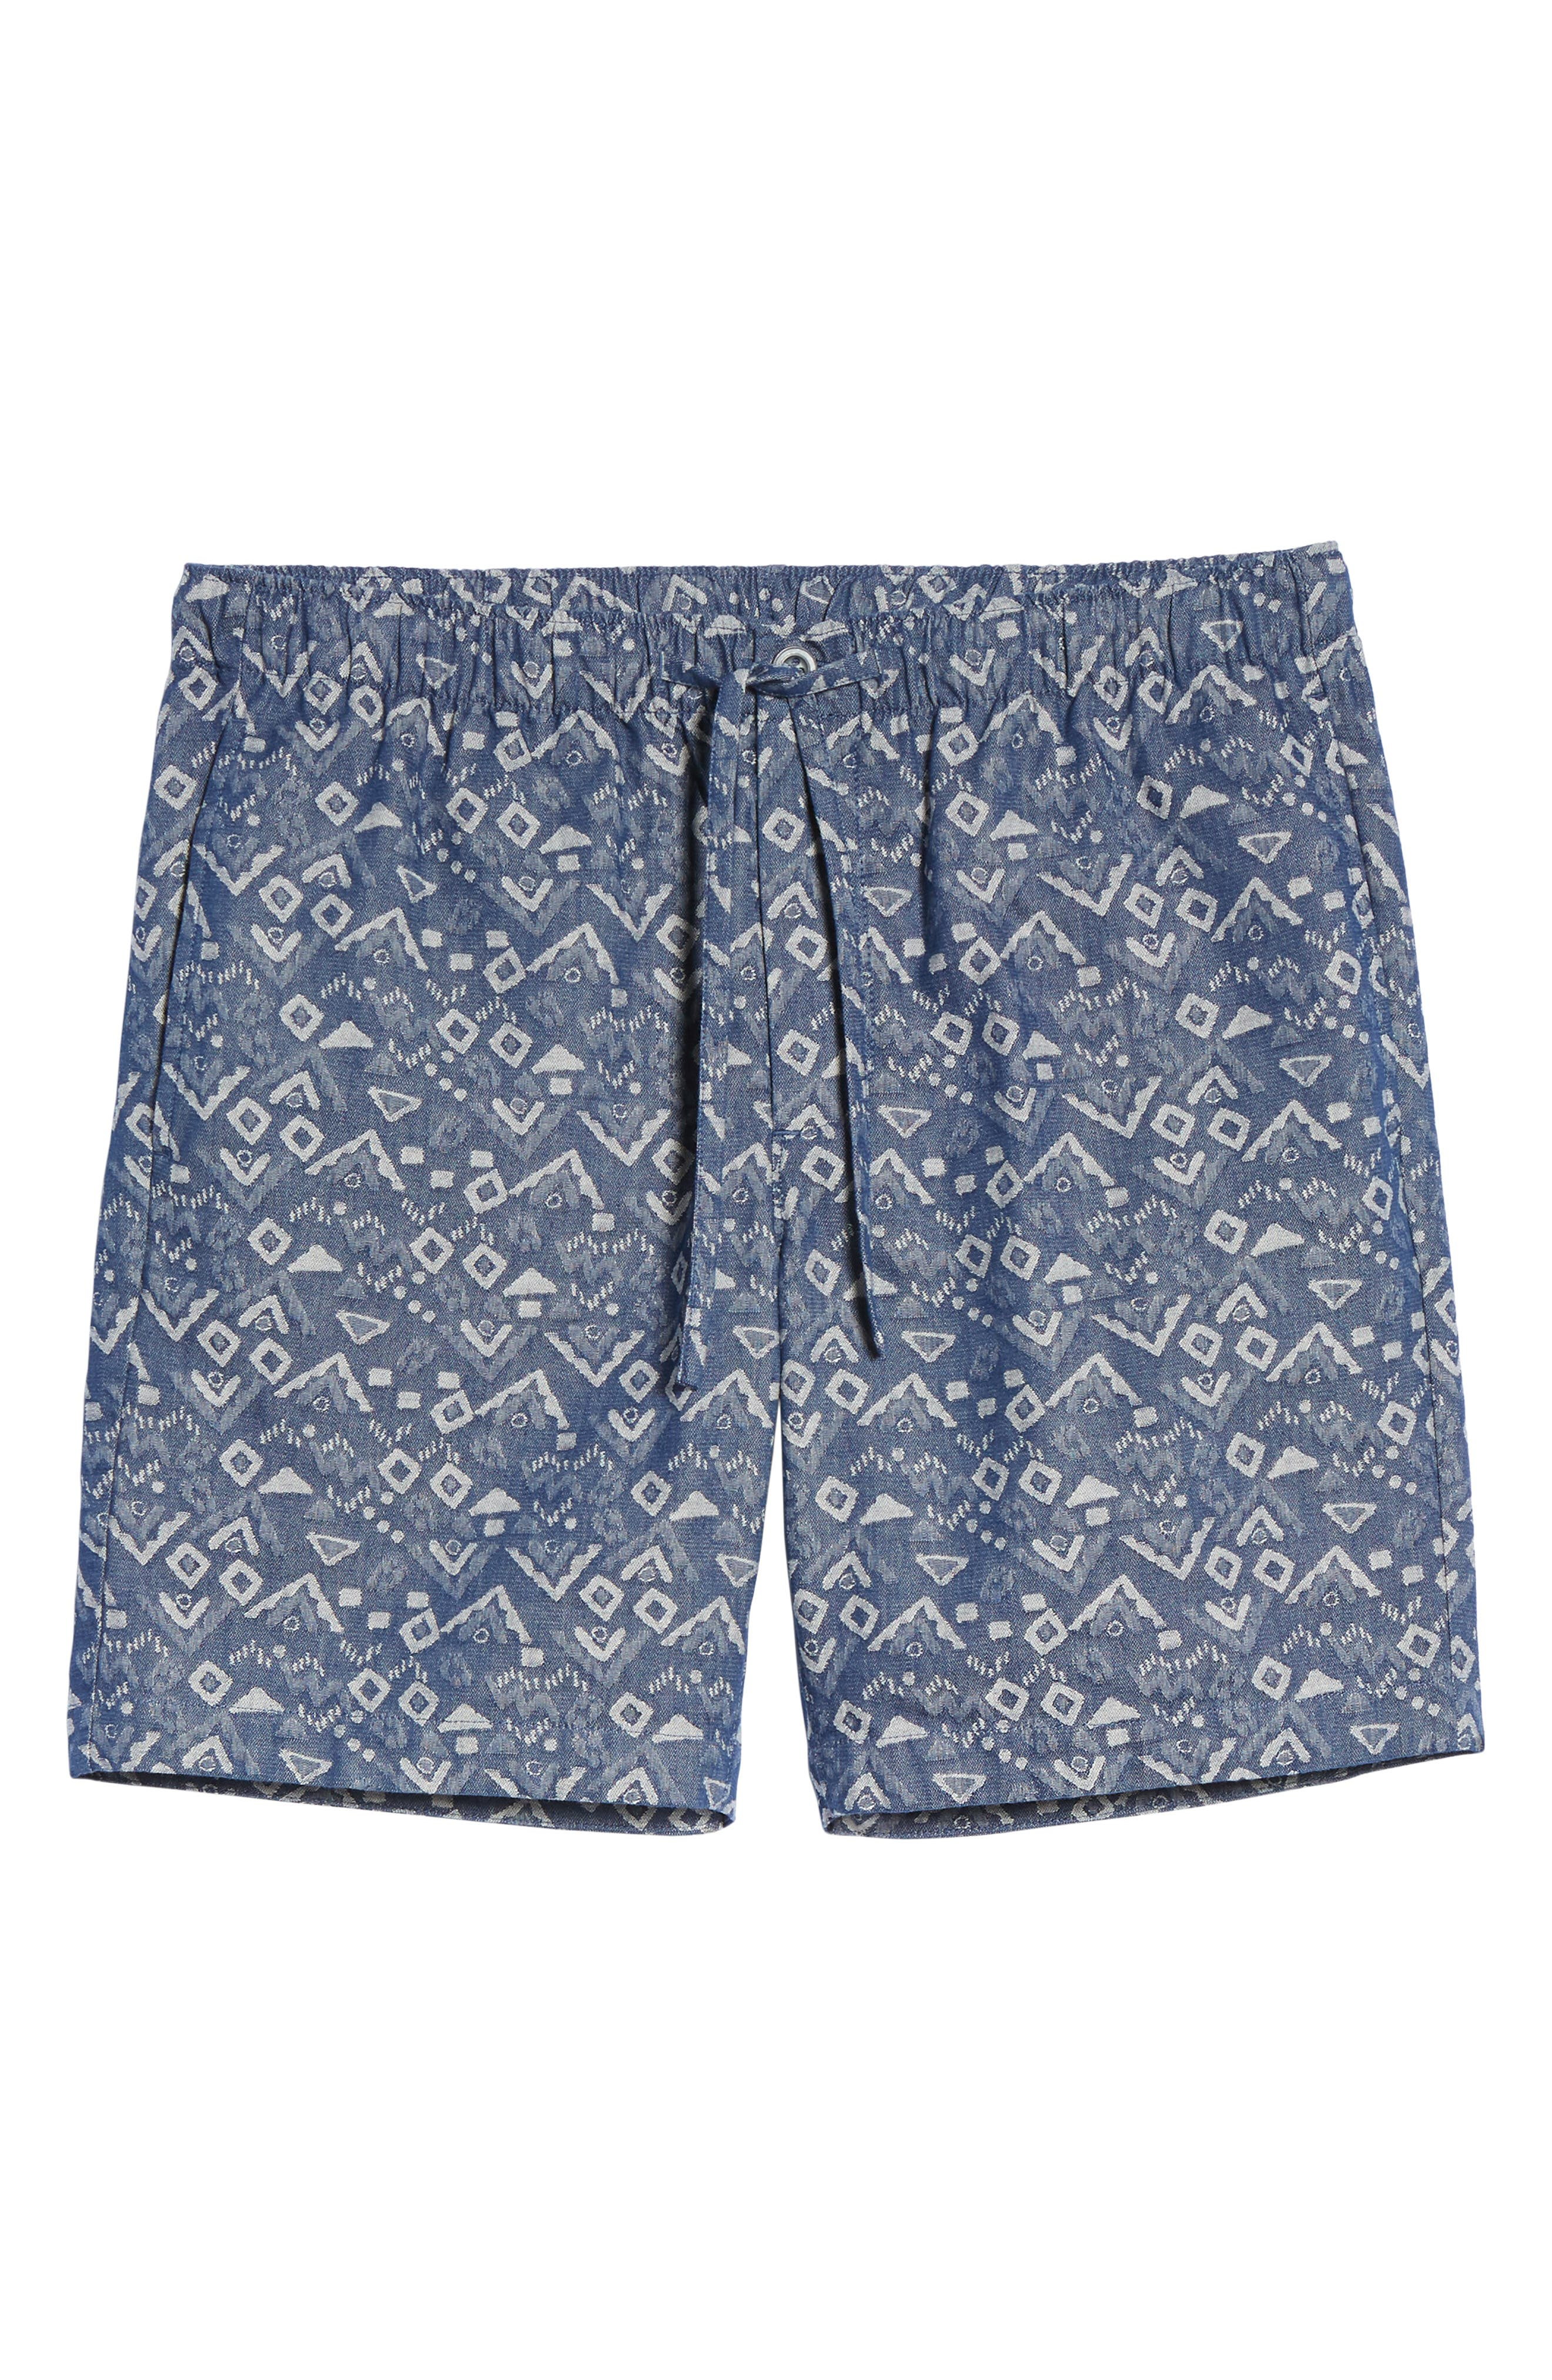 Slim Fit Print Beach Shorts,                             Alternate thumbnail 6, color,                             400